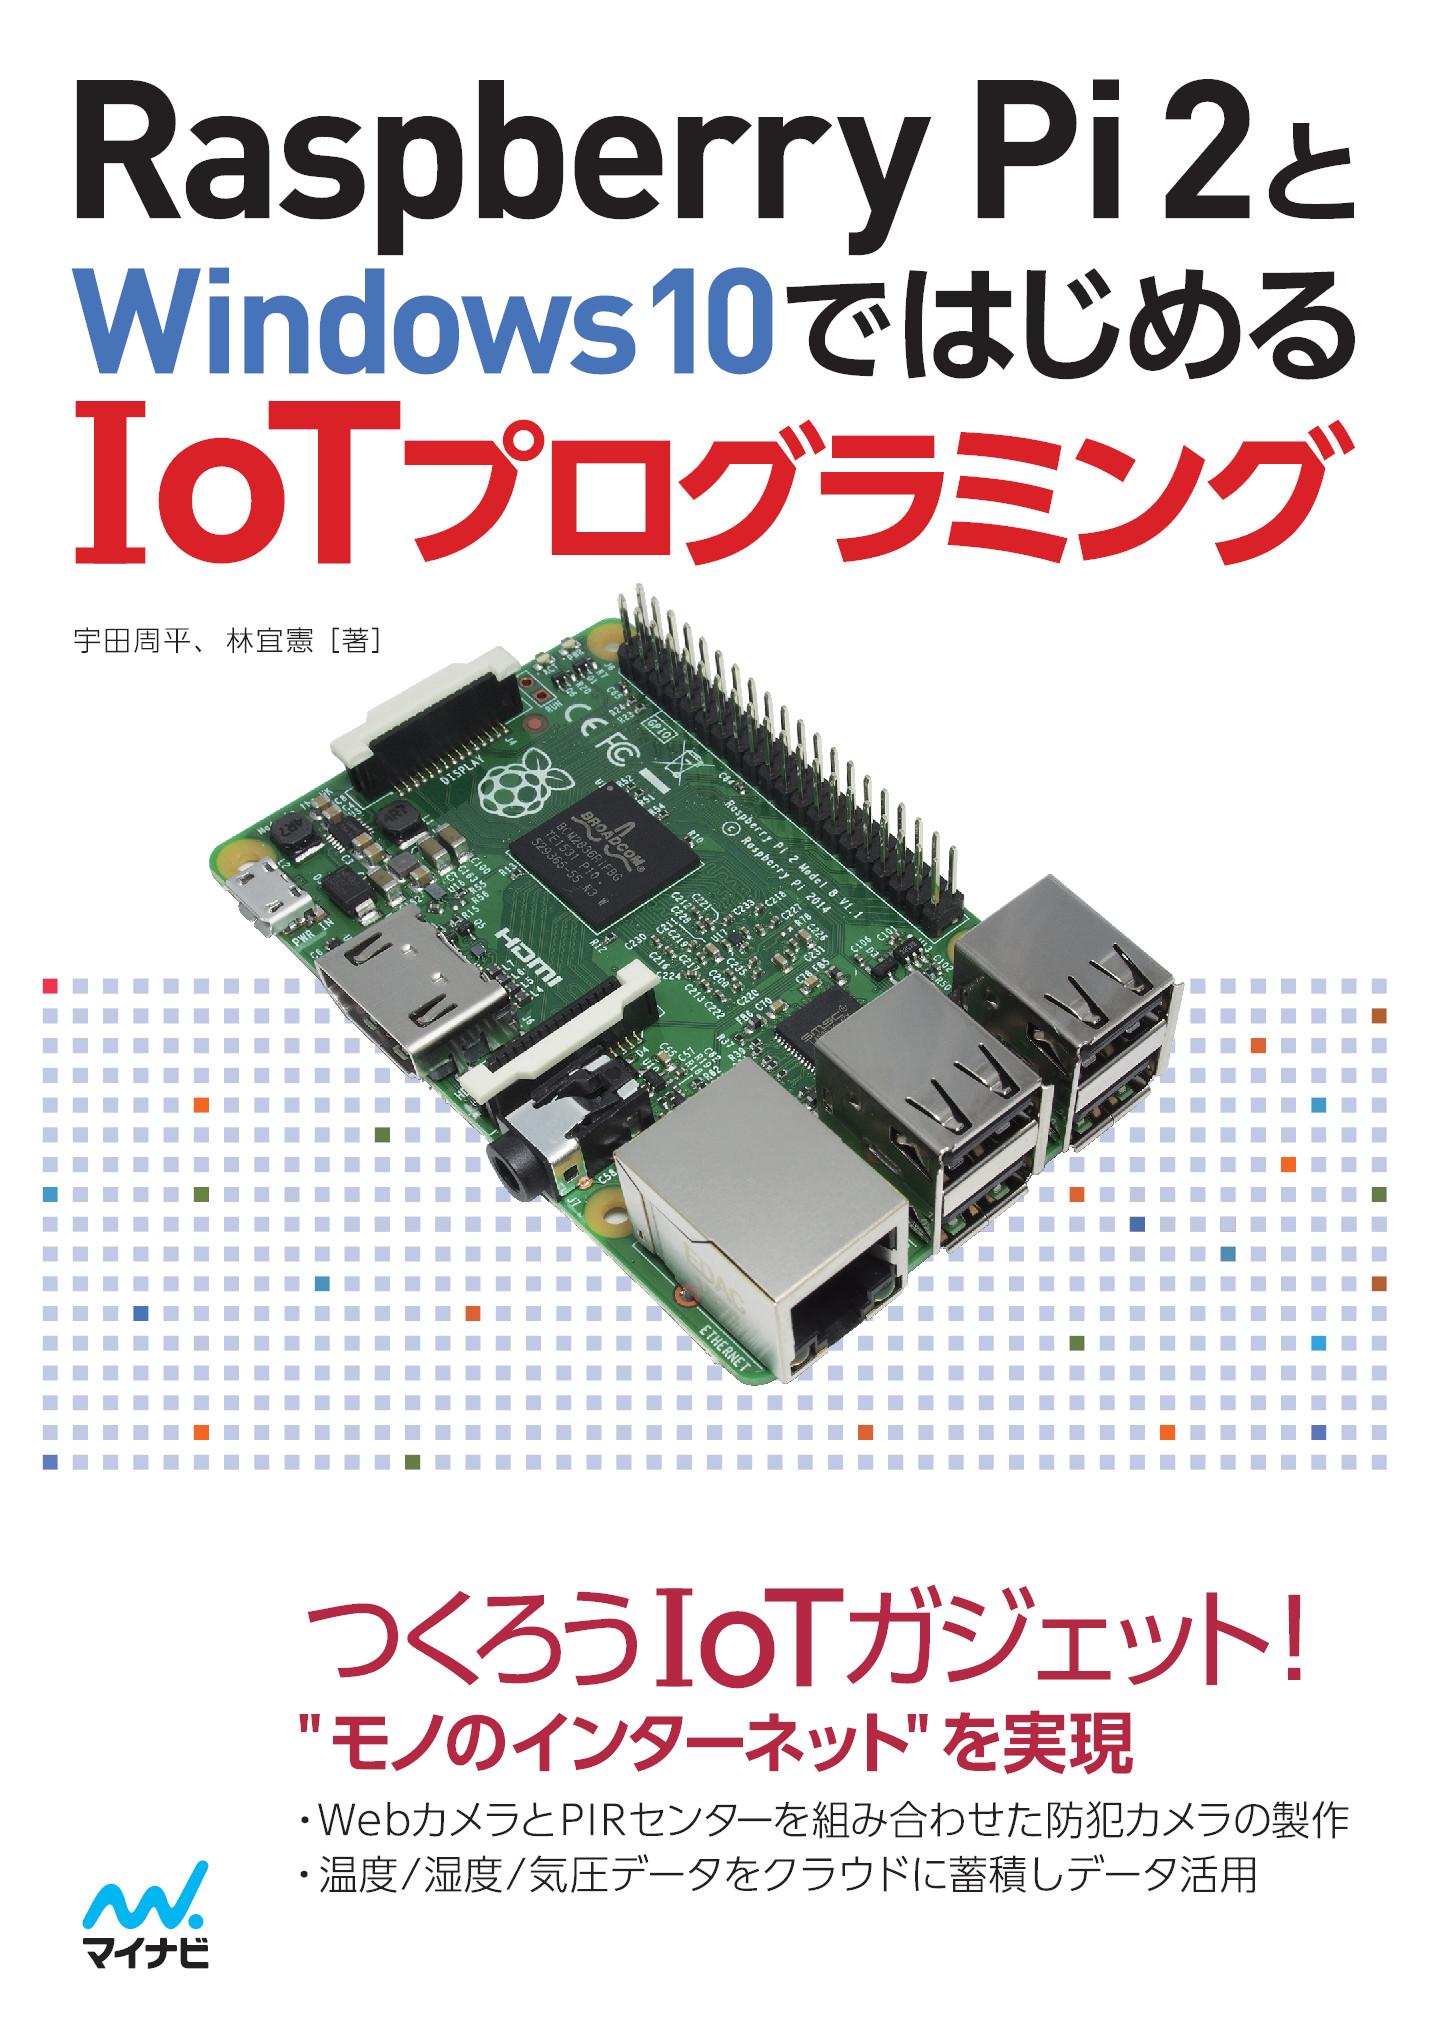 windows10 購入 ダウンロード